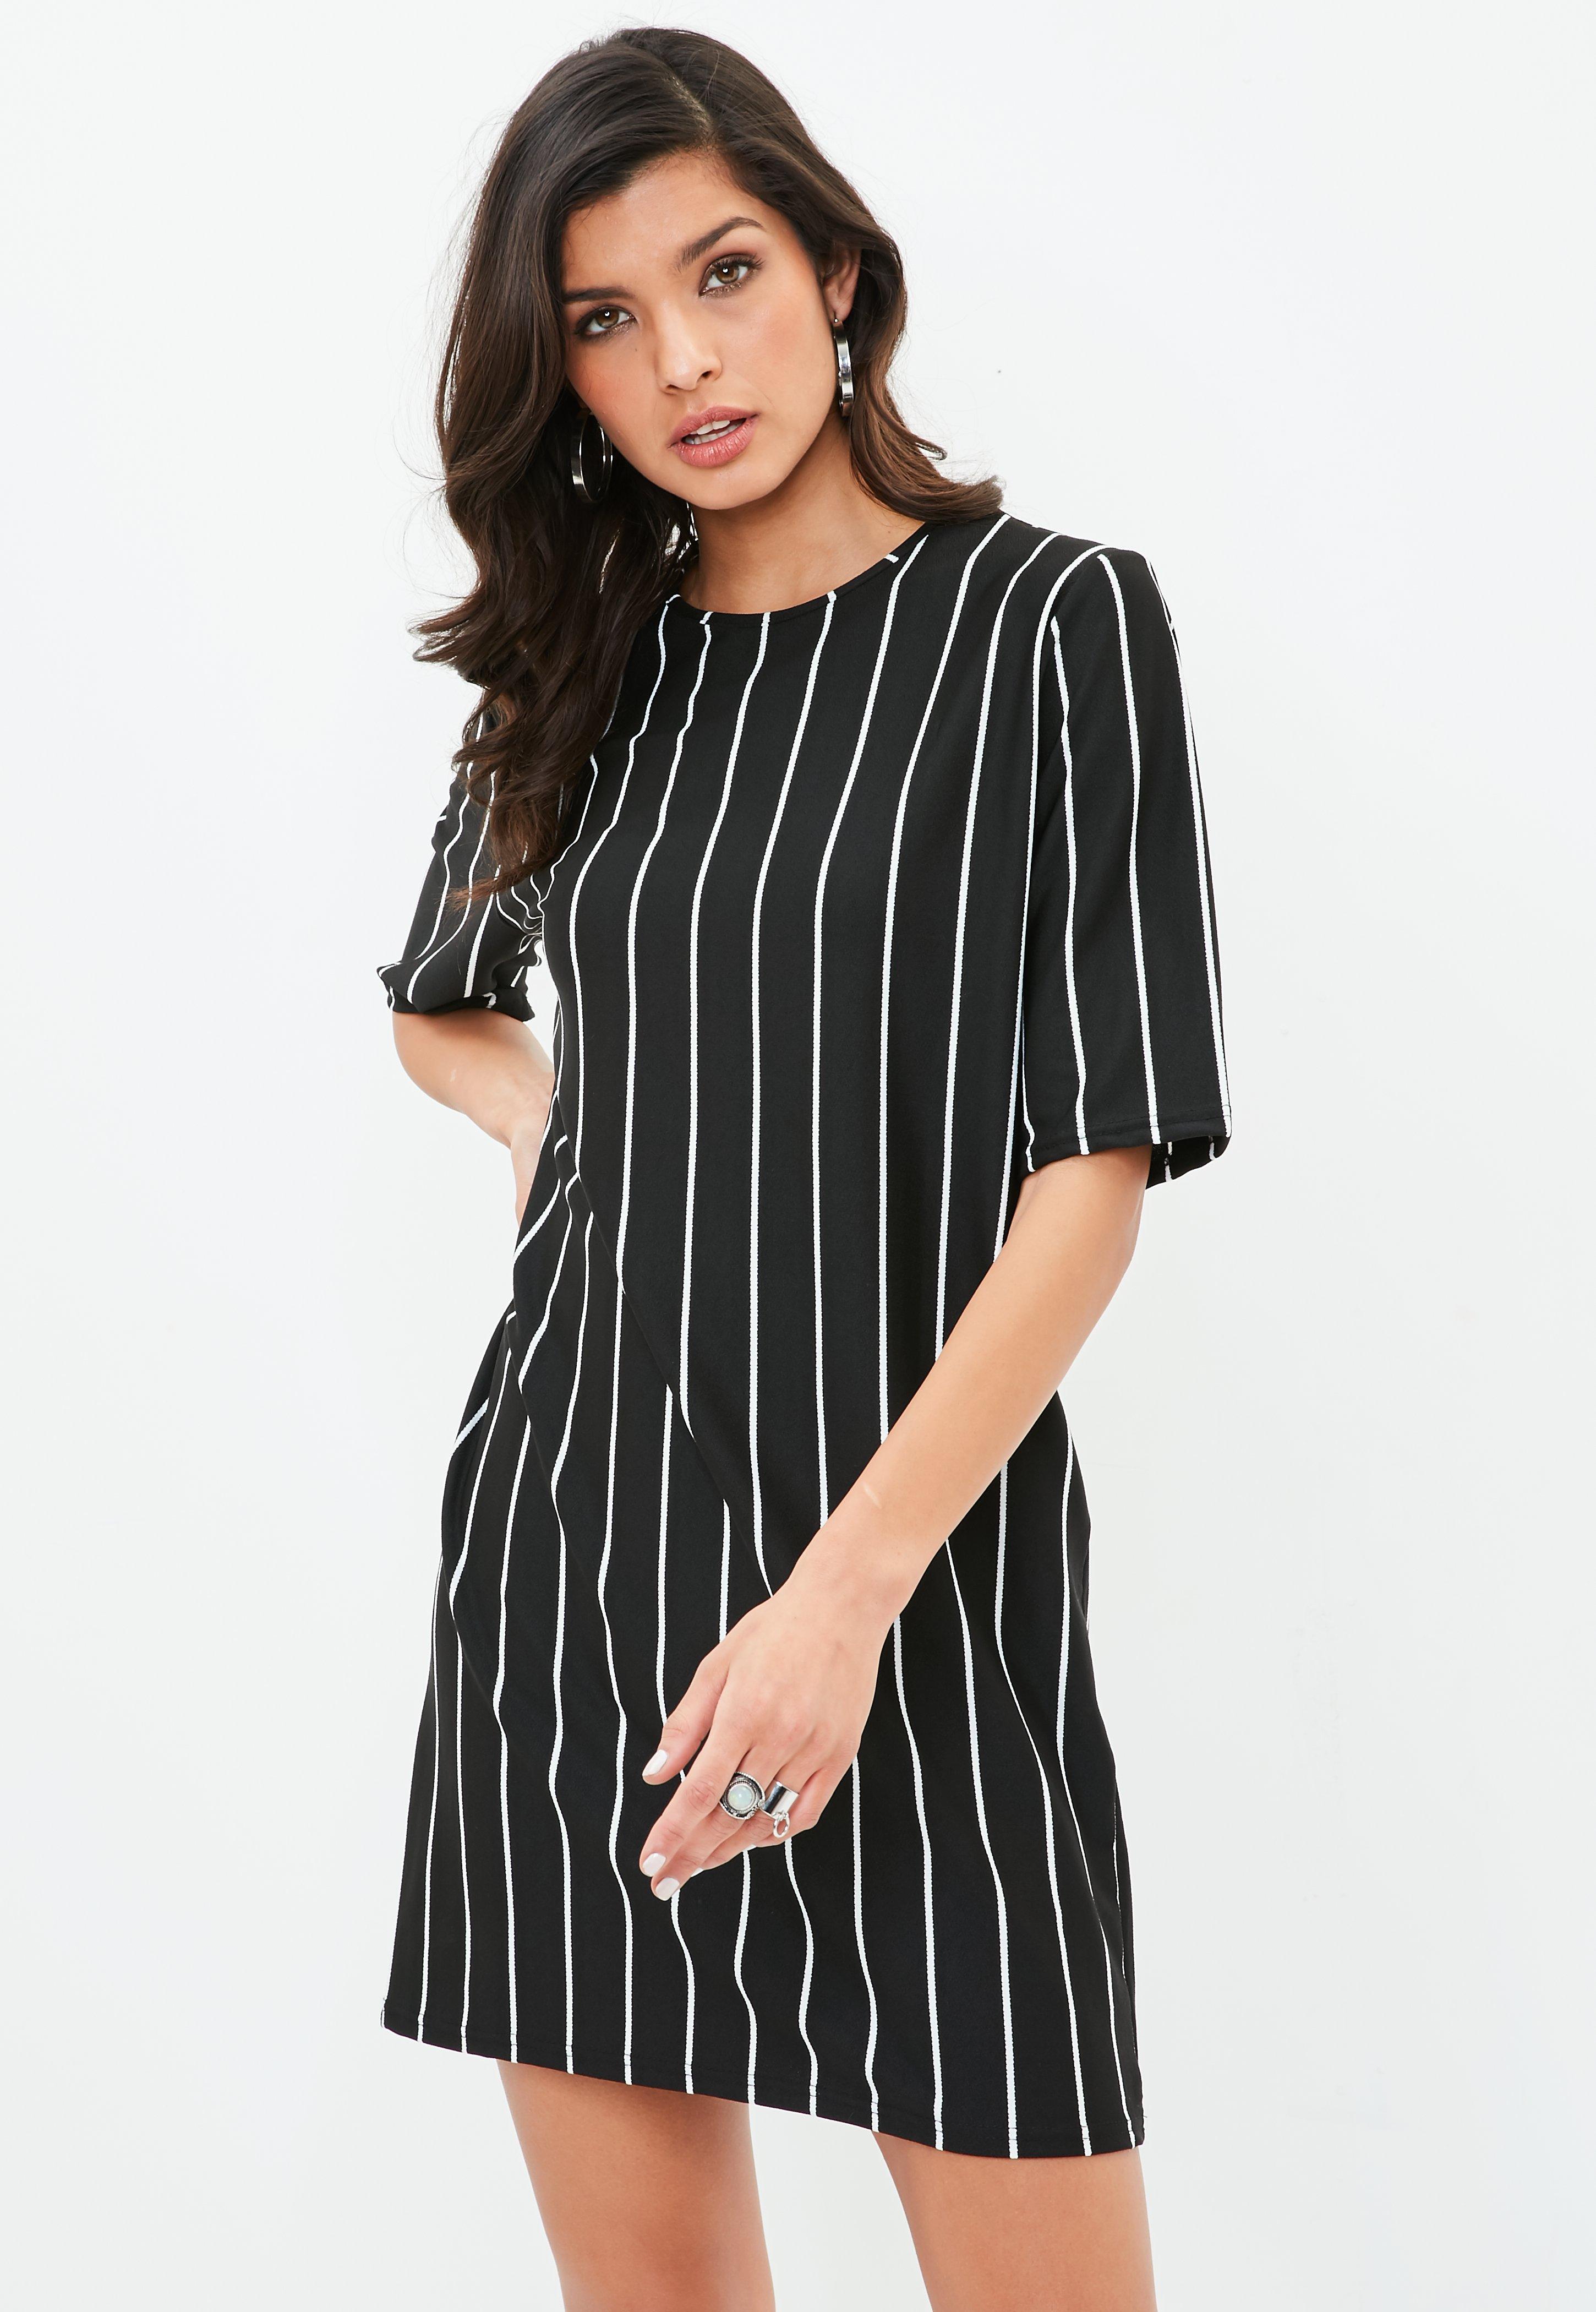 Ecm black models in dresses